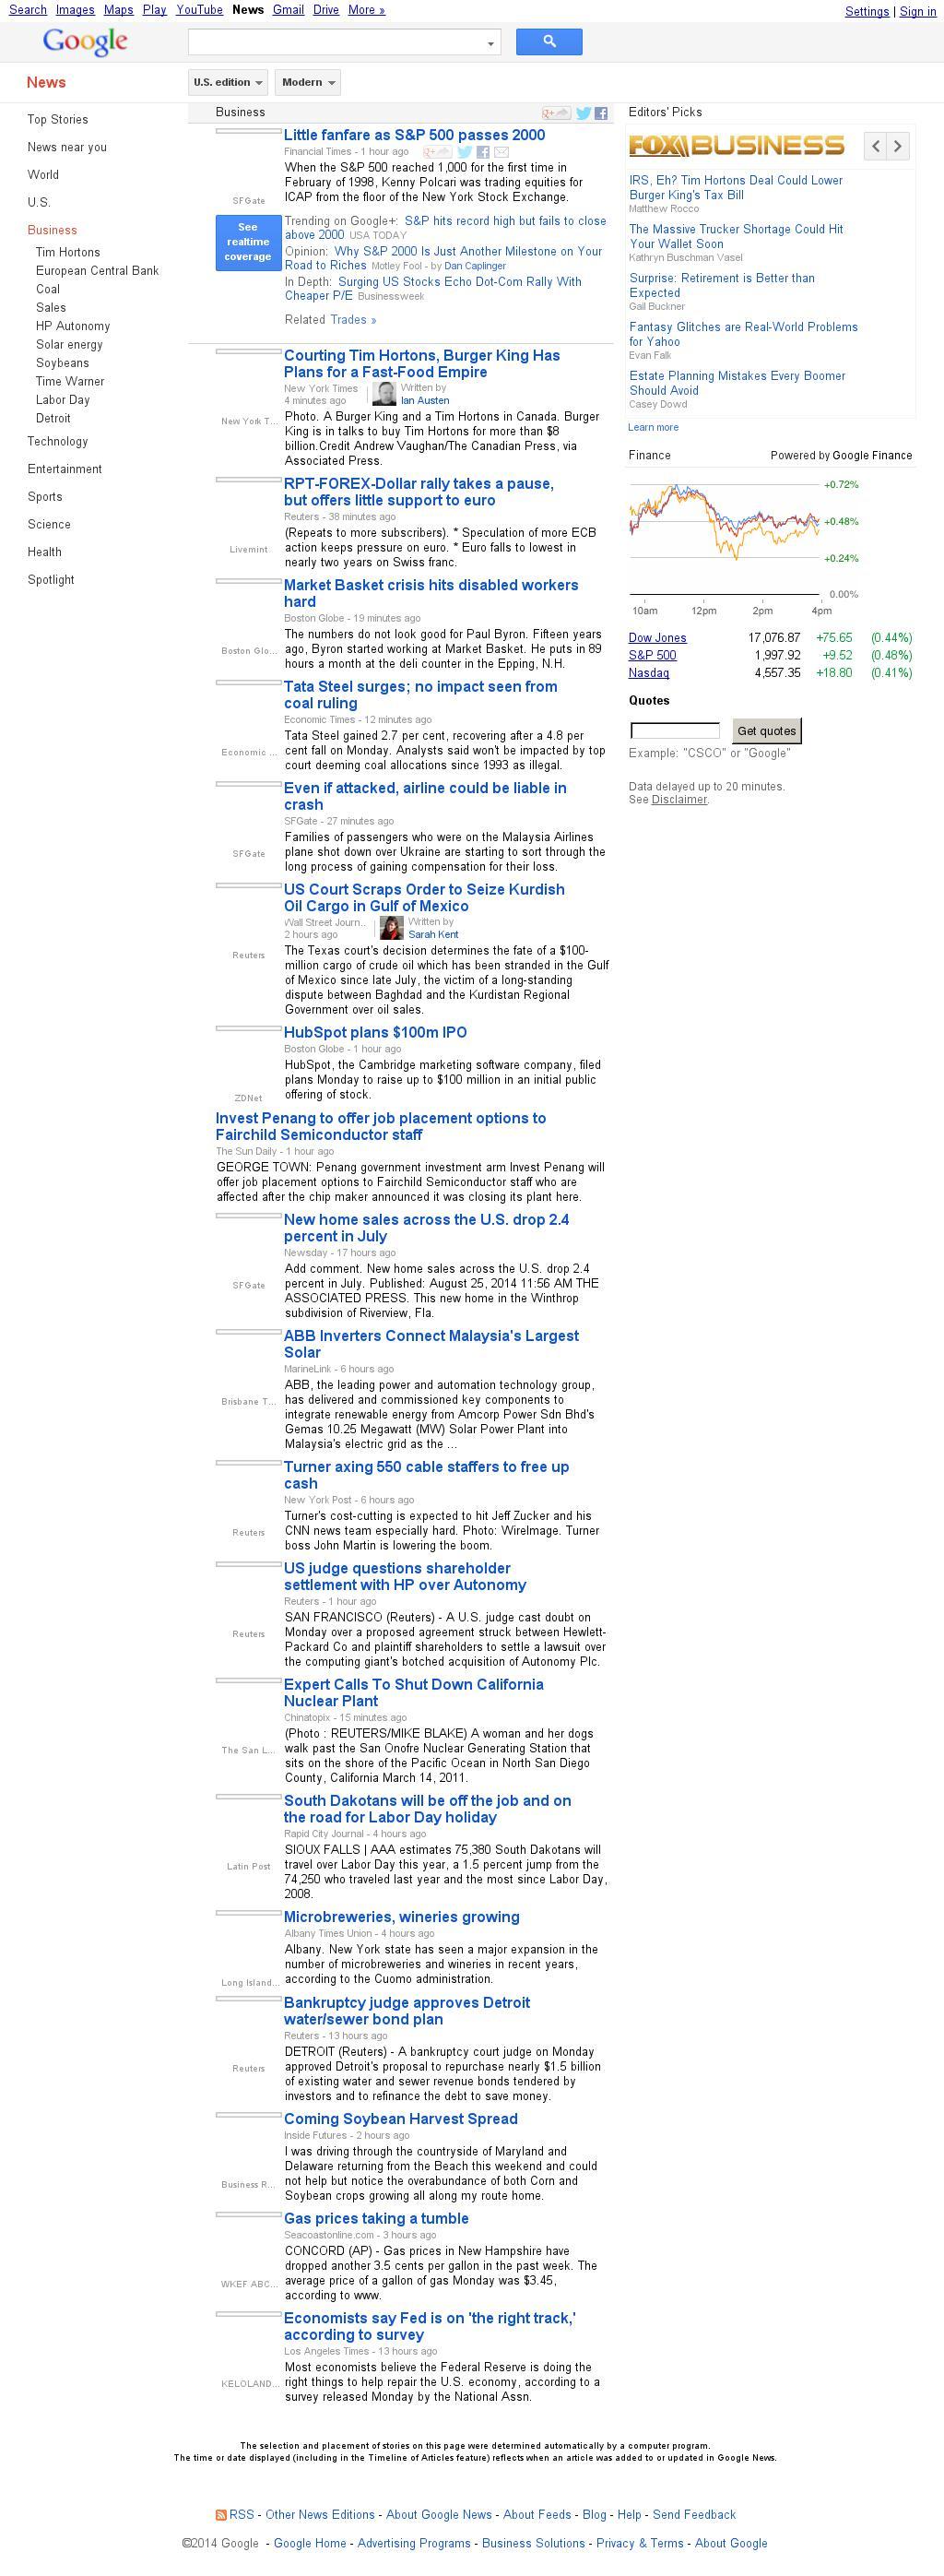 Google News: Business at Tuesday Aug. 26, 2014, 10:06 a.m. UTC